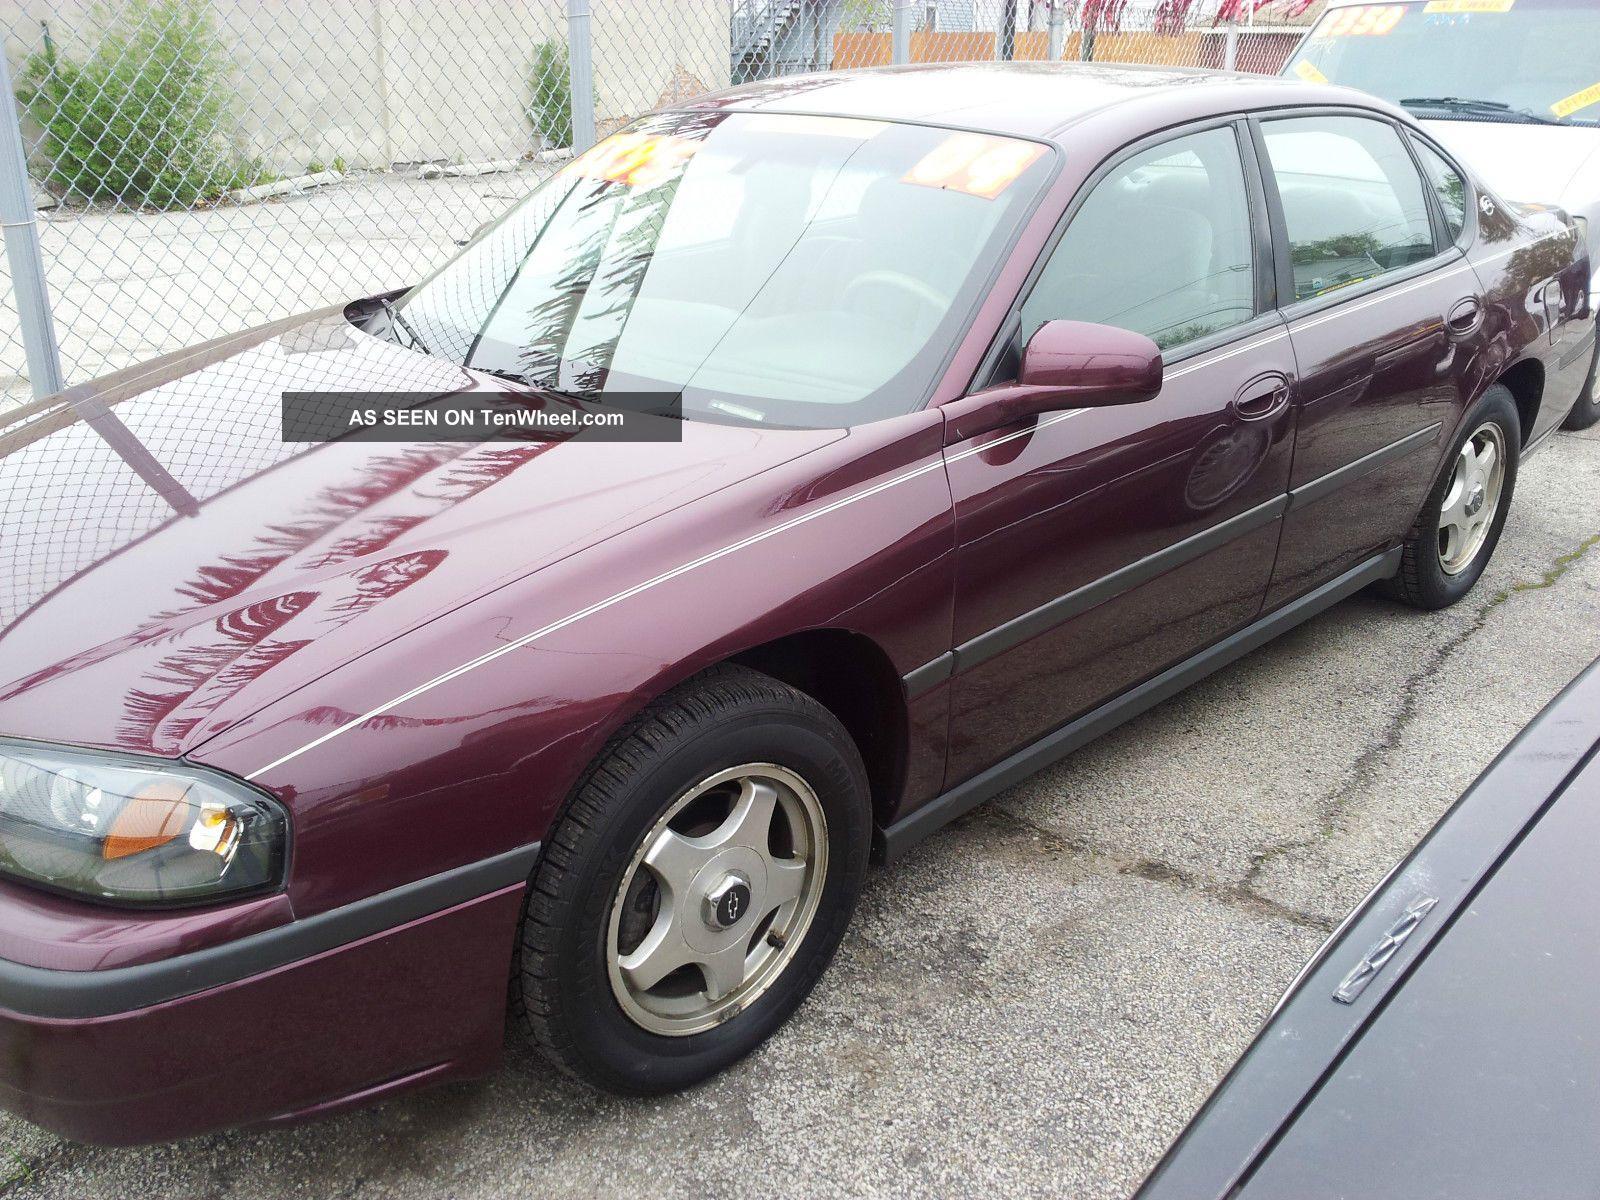 2004 Chevrolet Impala Ls Impala photo